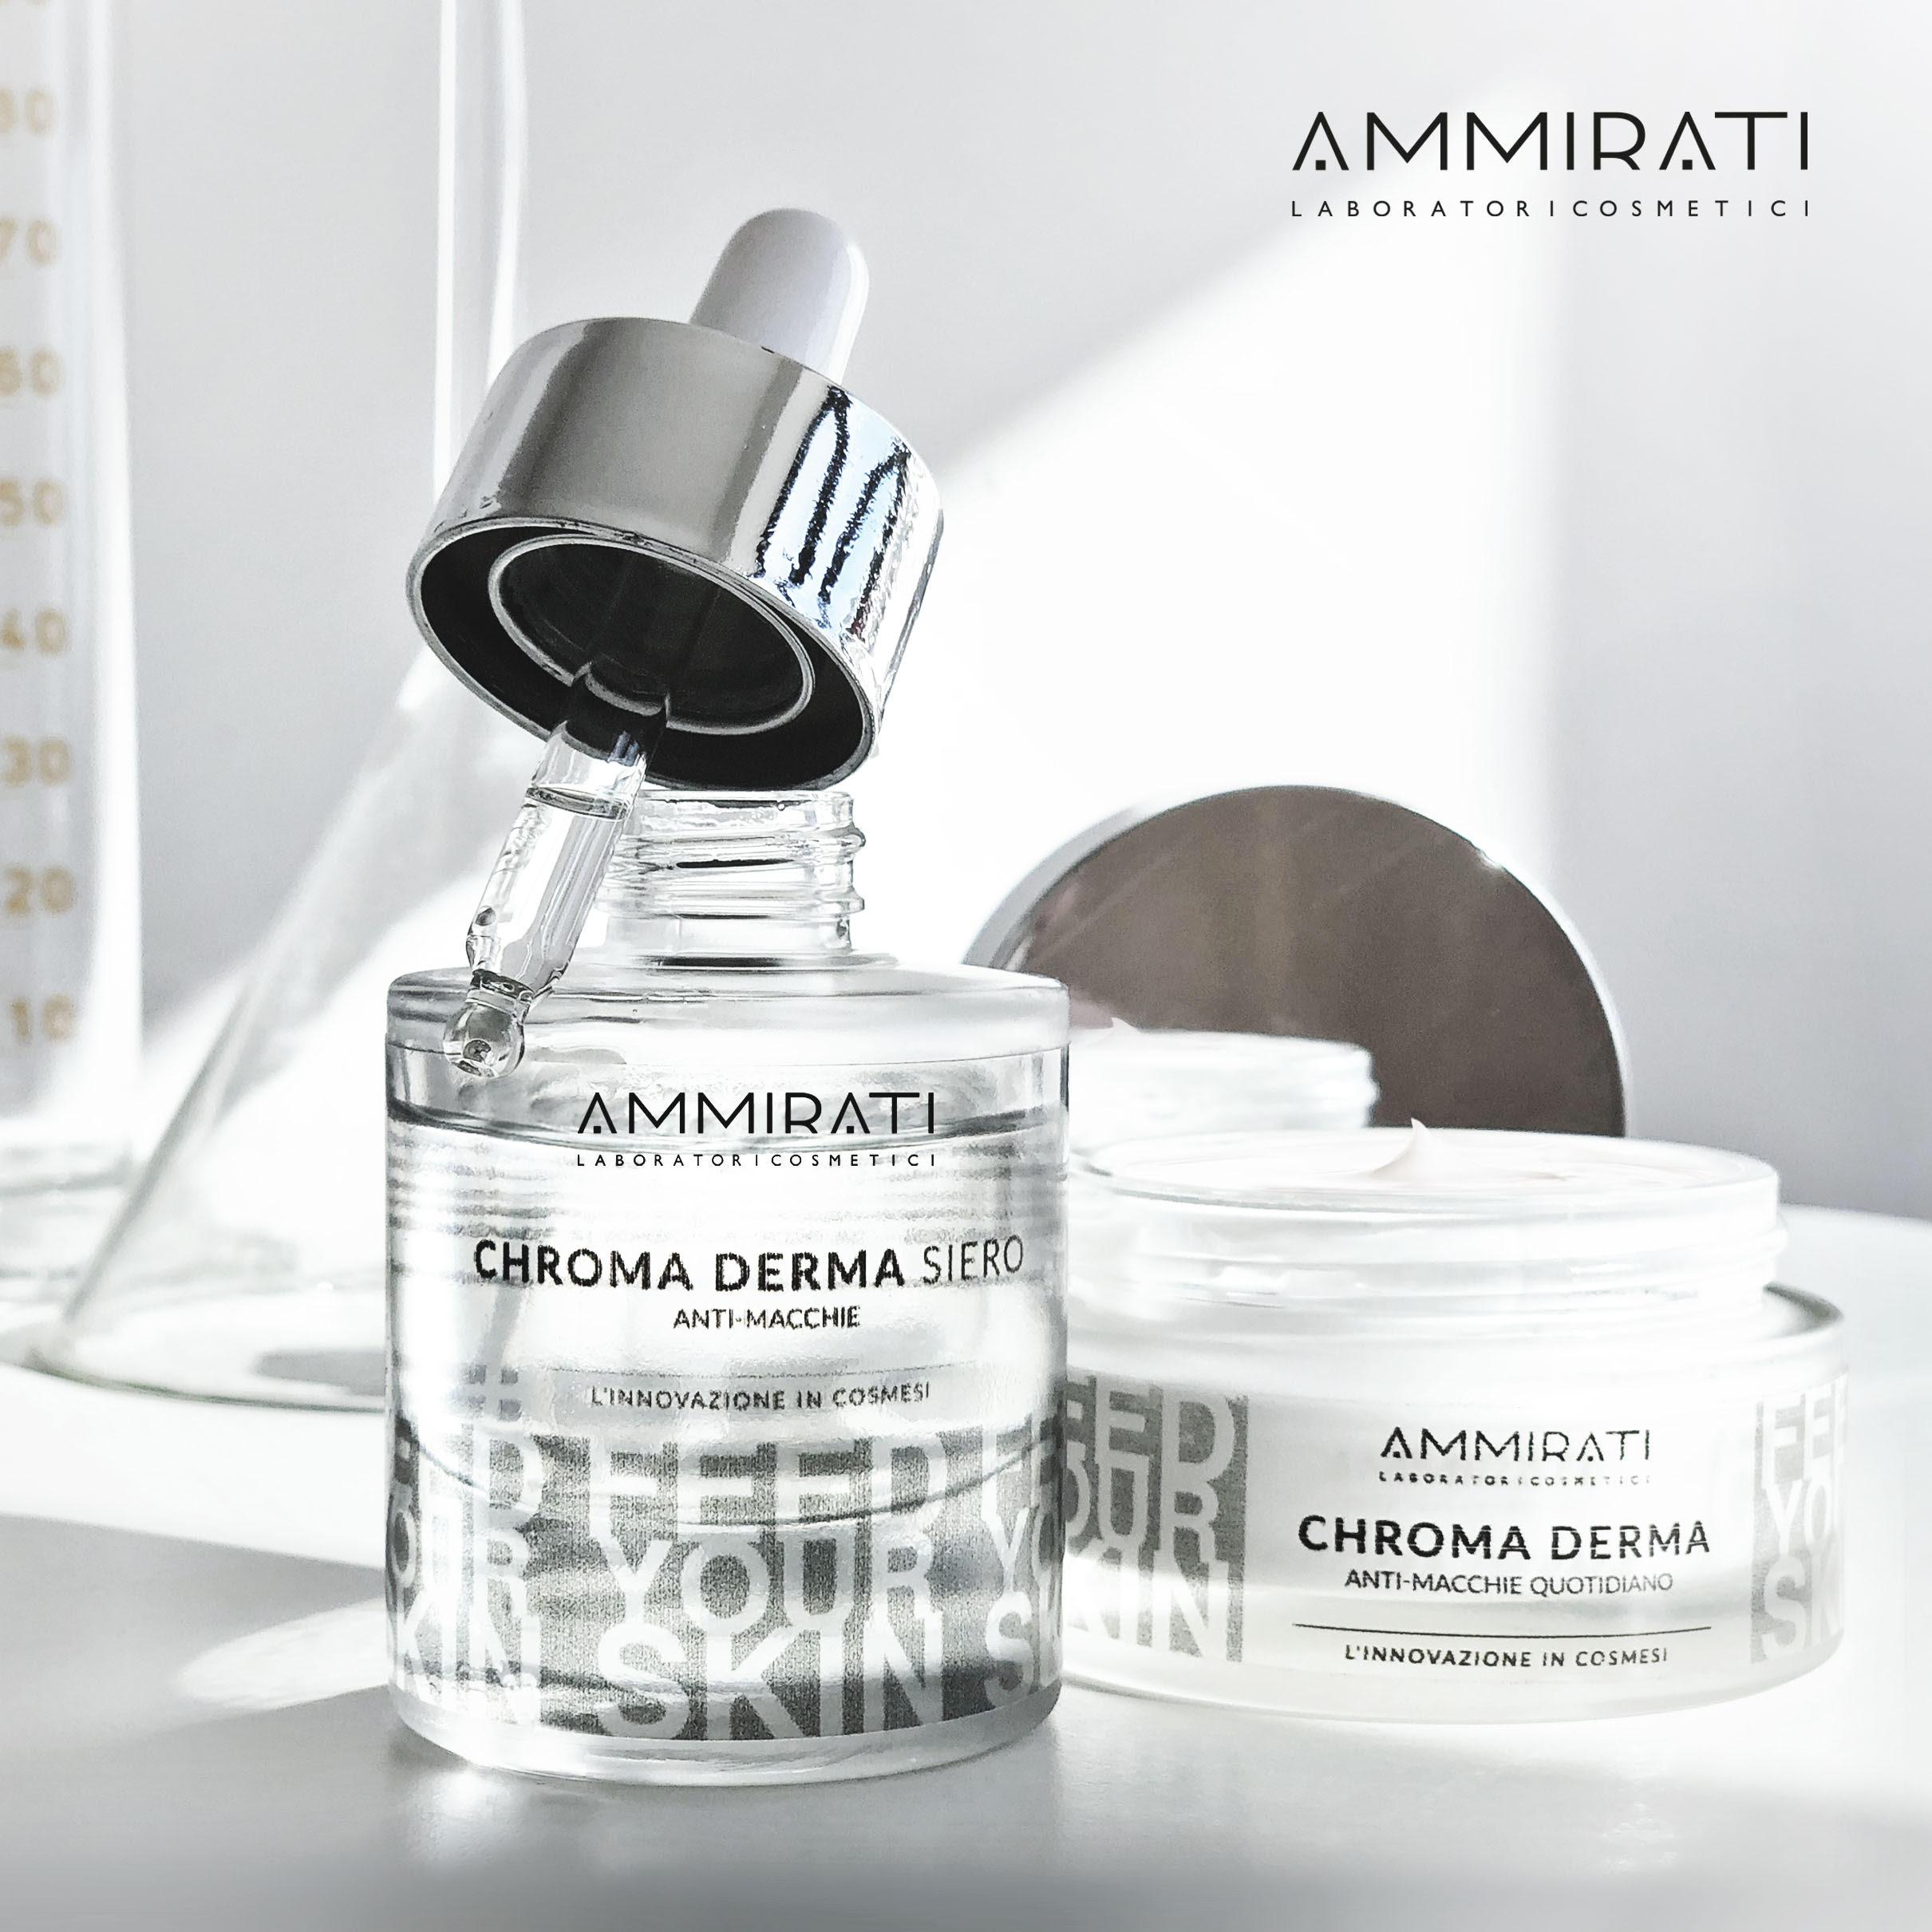 Chroma Derma Siero | Ammirati Cosmetici